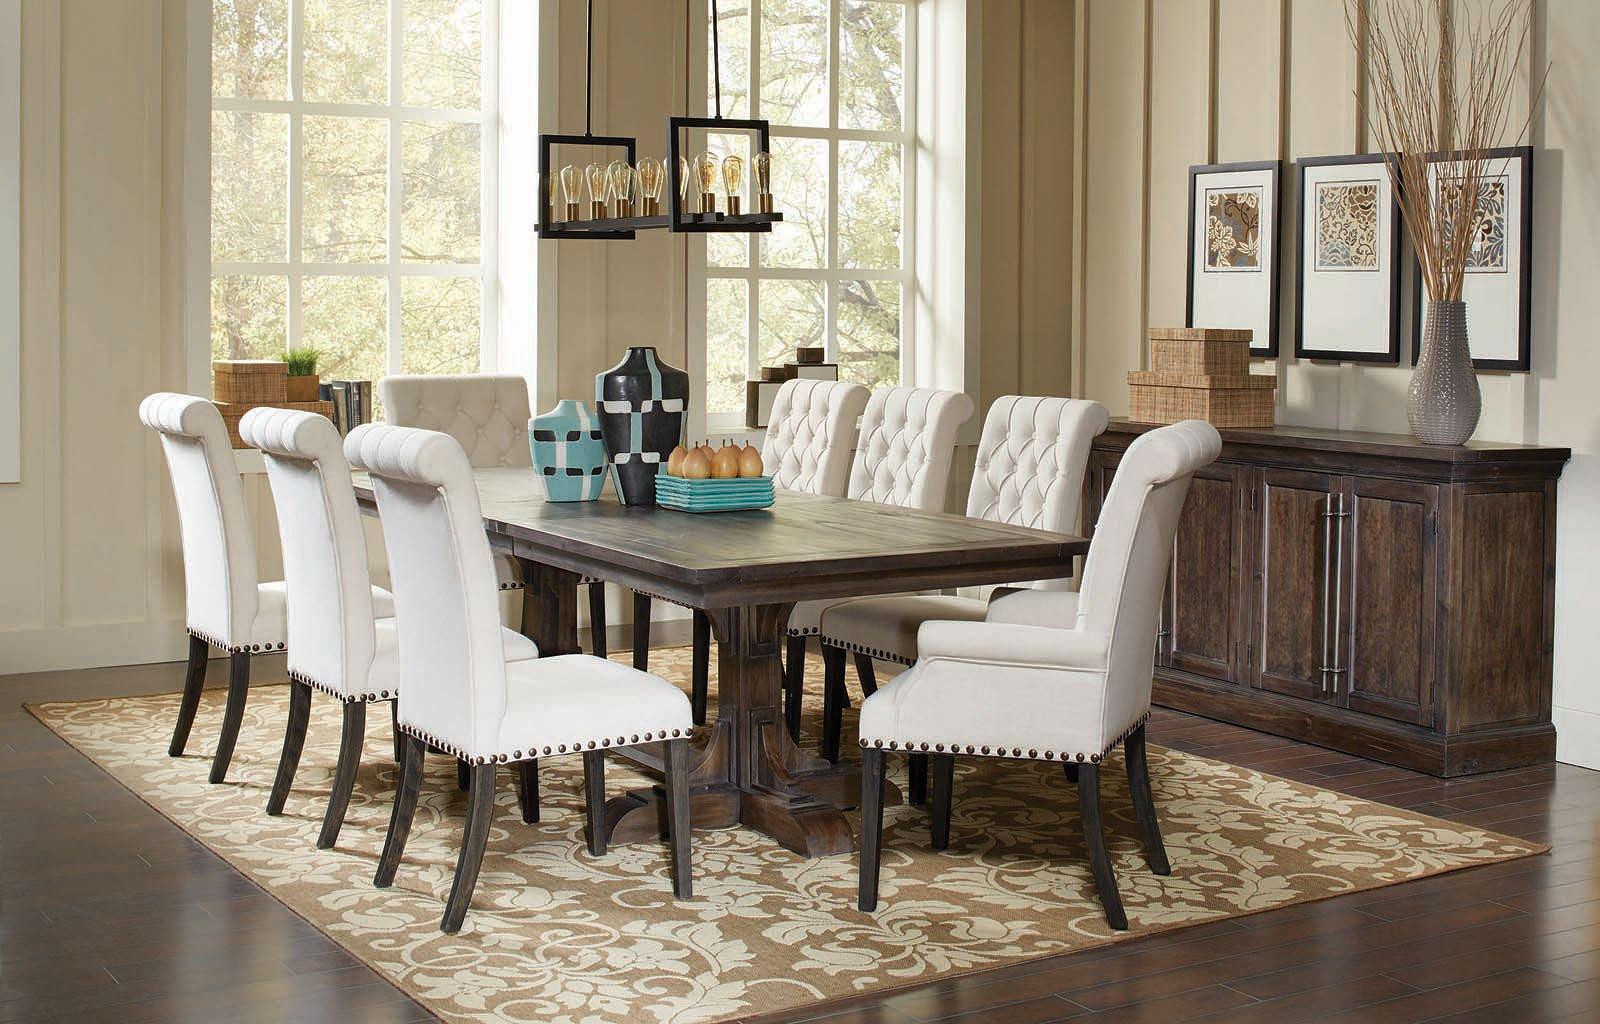 weber dining room set w cream chairs formal dining sets dining room and kitchen furniture. Black Bedroom Furniture Sets. Home Design Ideas